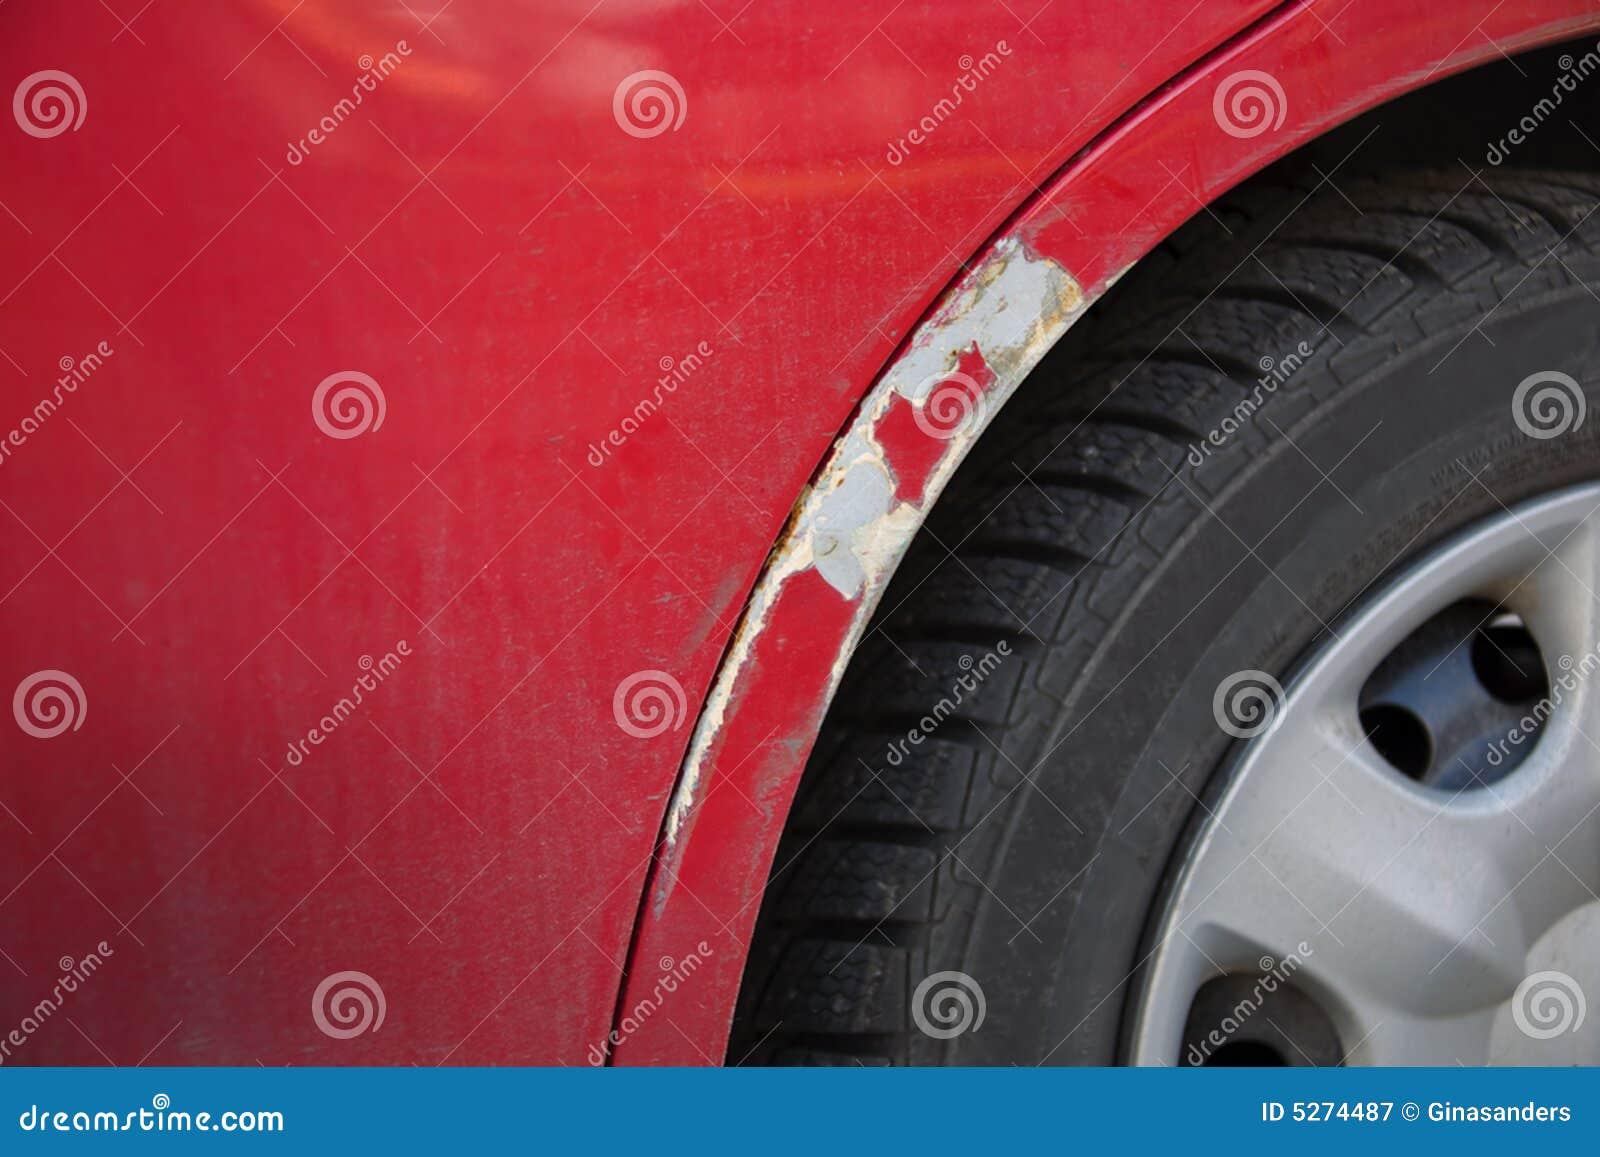 Гарантия на сквозную коррозию Nissan Almera Classic